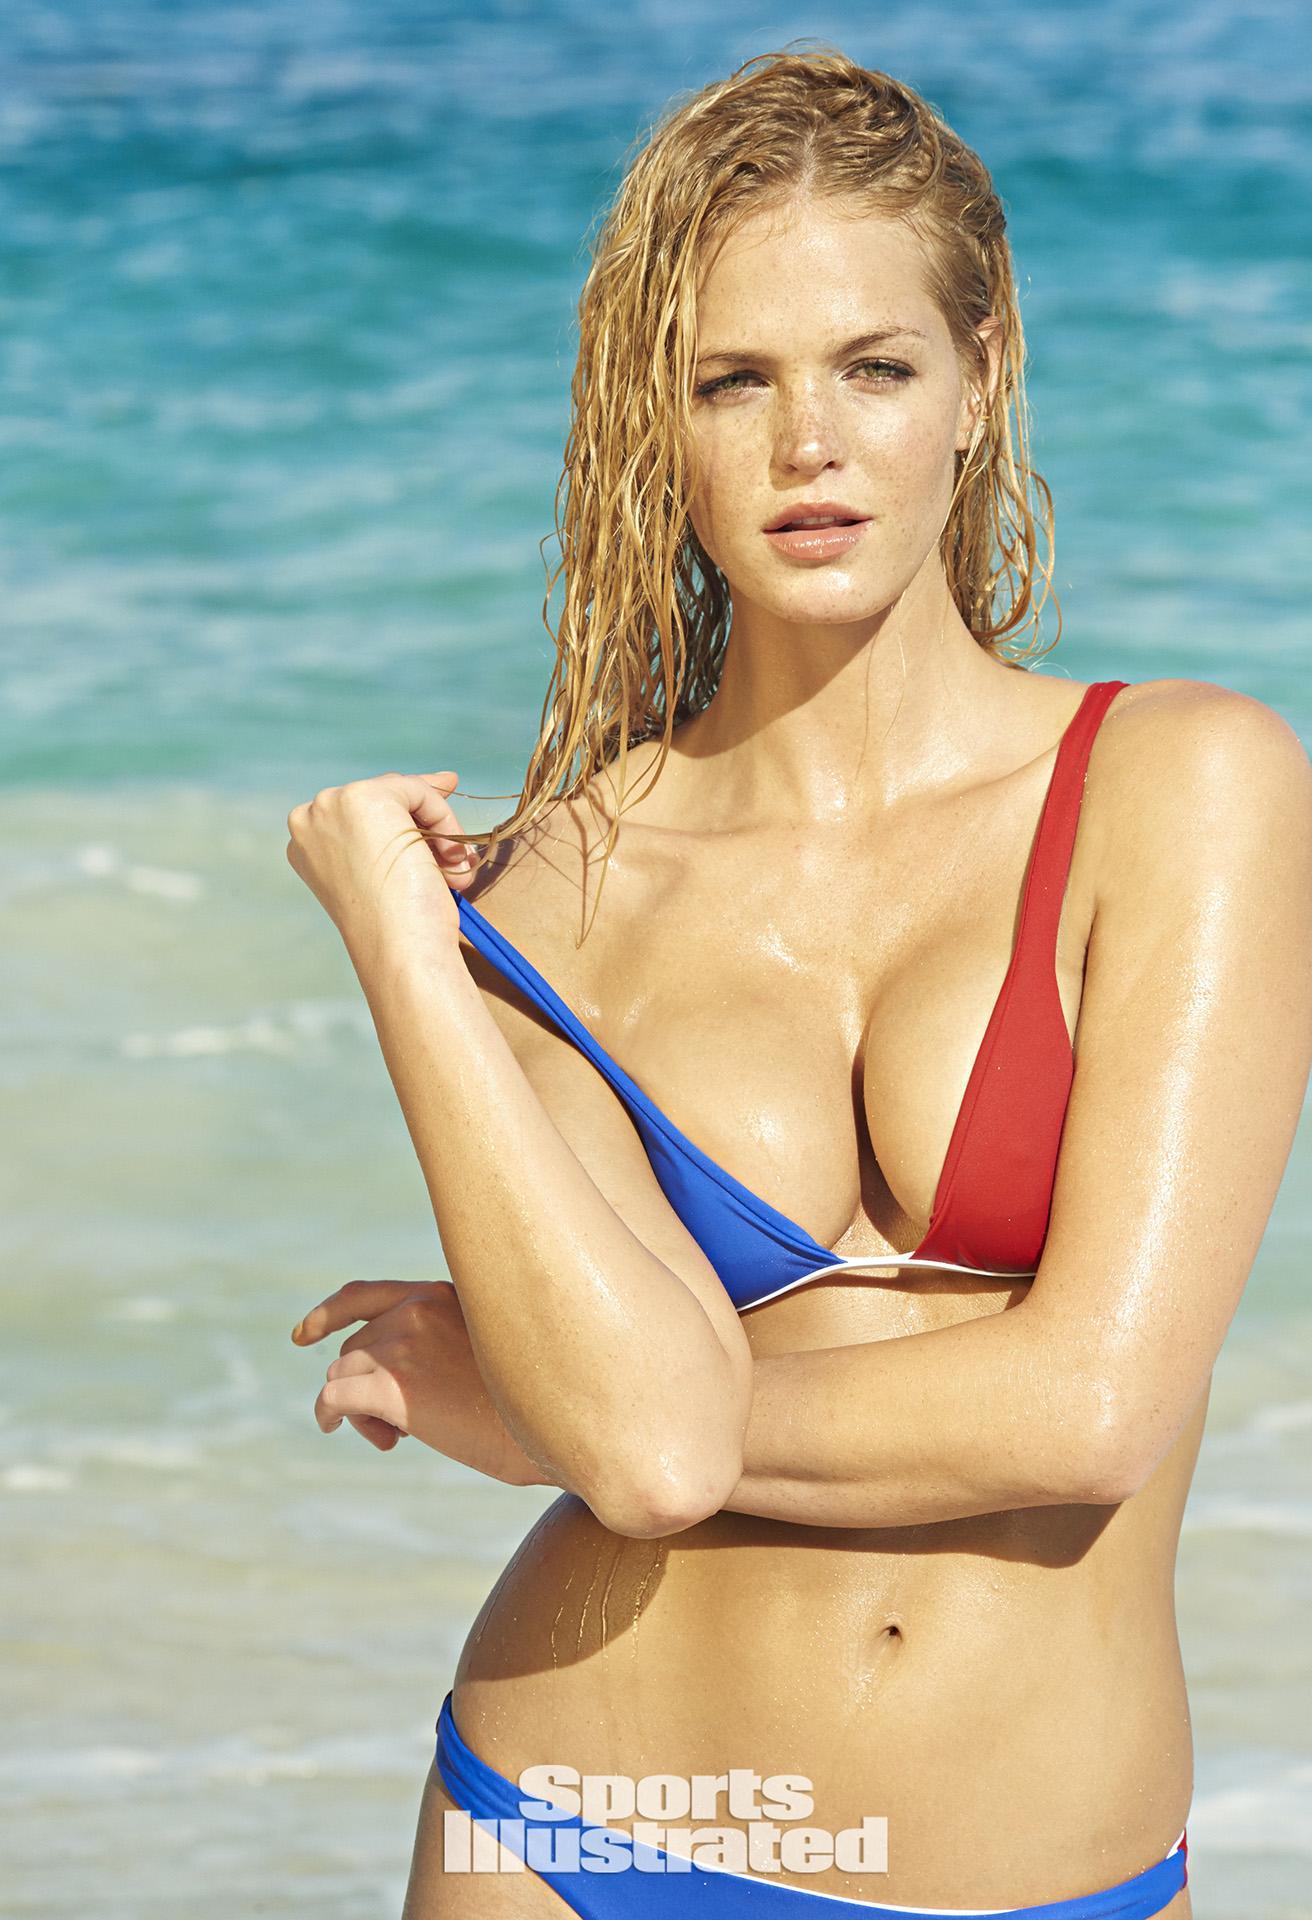 Erin Heatherton nudes (57 foto), pictures Bikini, Twitter, underwear 2019